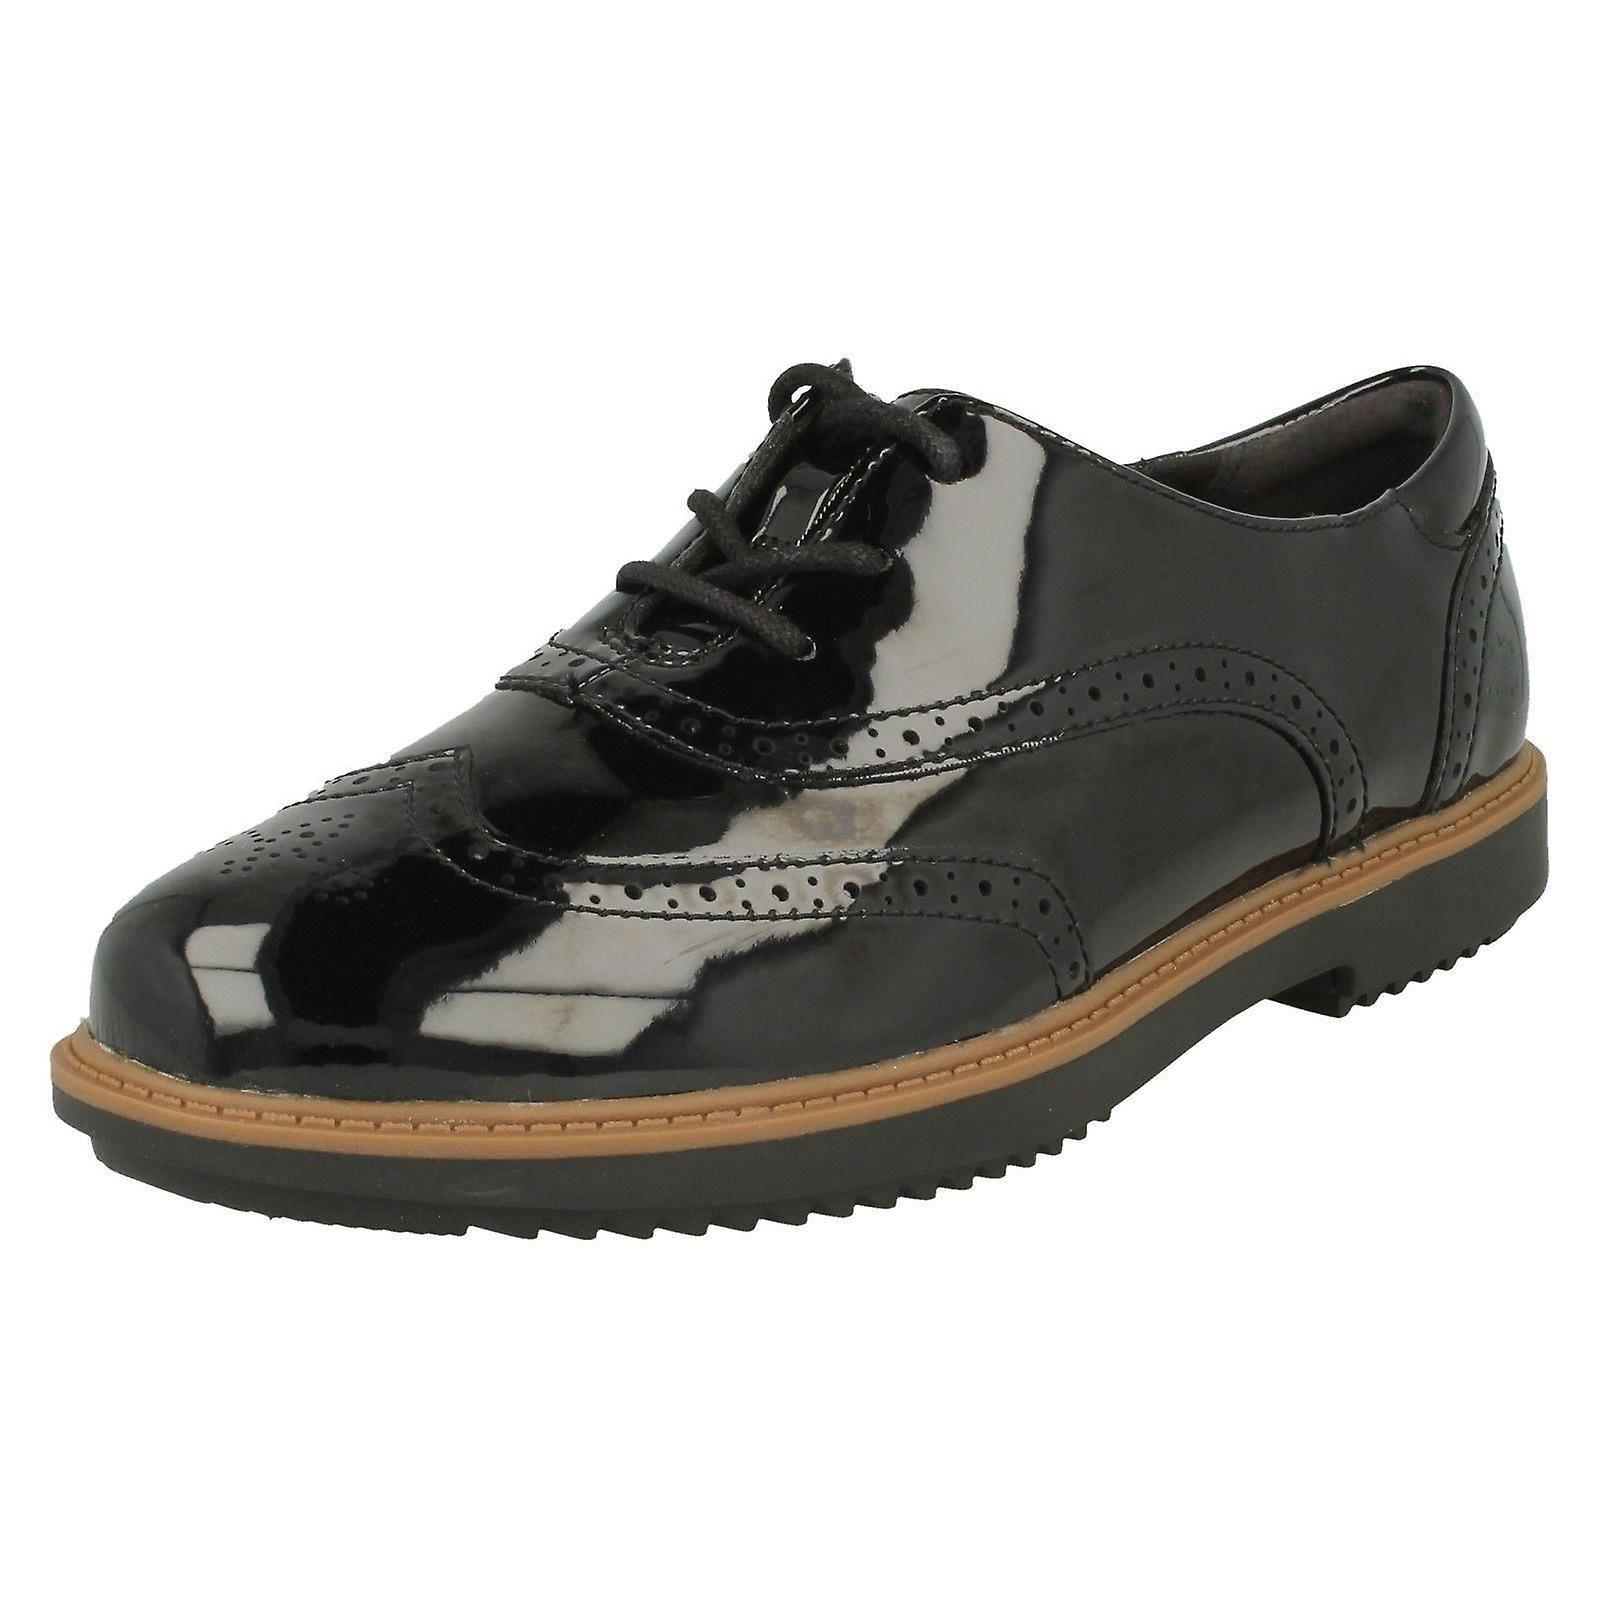 Ladies Clarks STRINGATE Brogue stile scarpe Raisie Hilde | Sale Italia  | Scolaro/Ragazze Scarpa